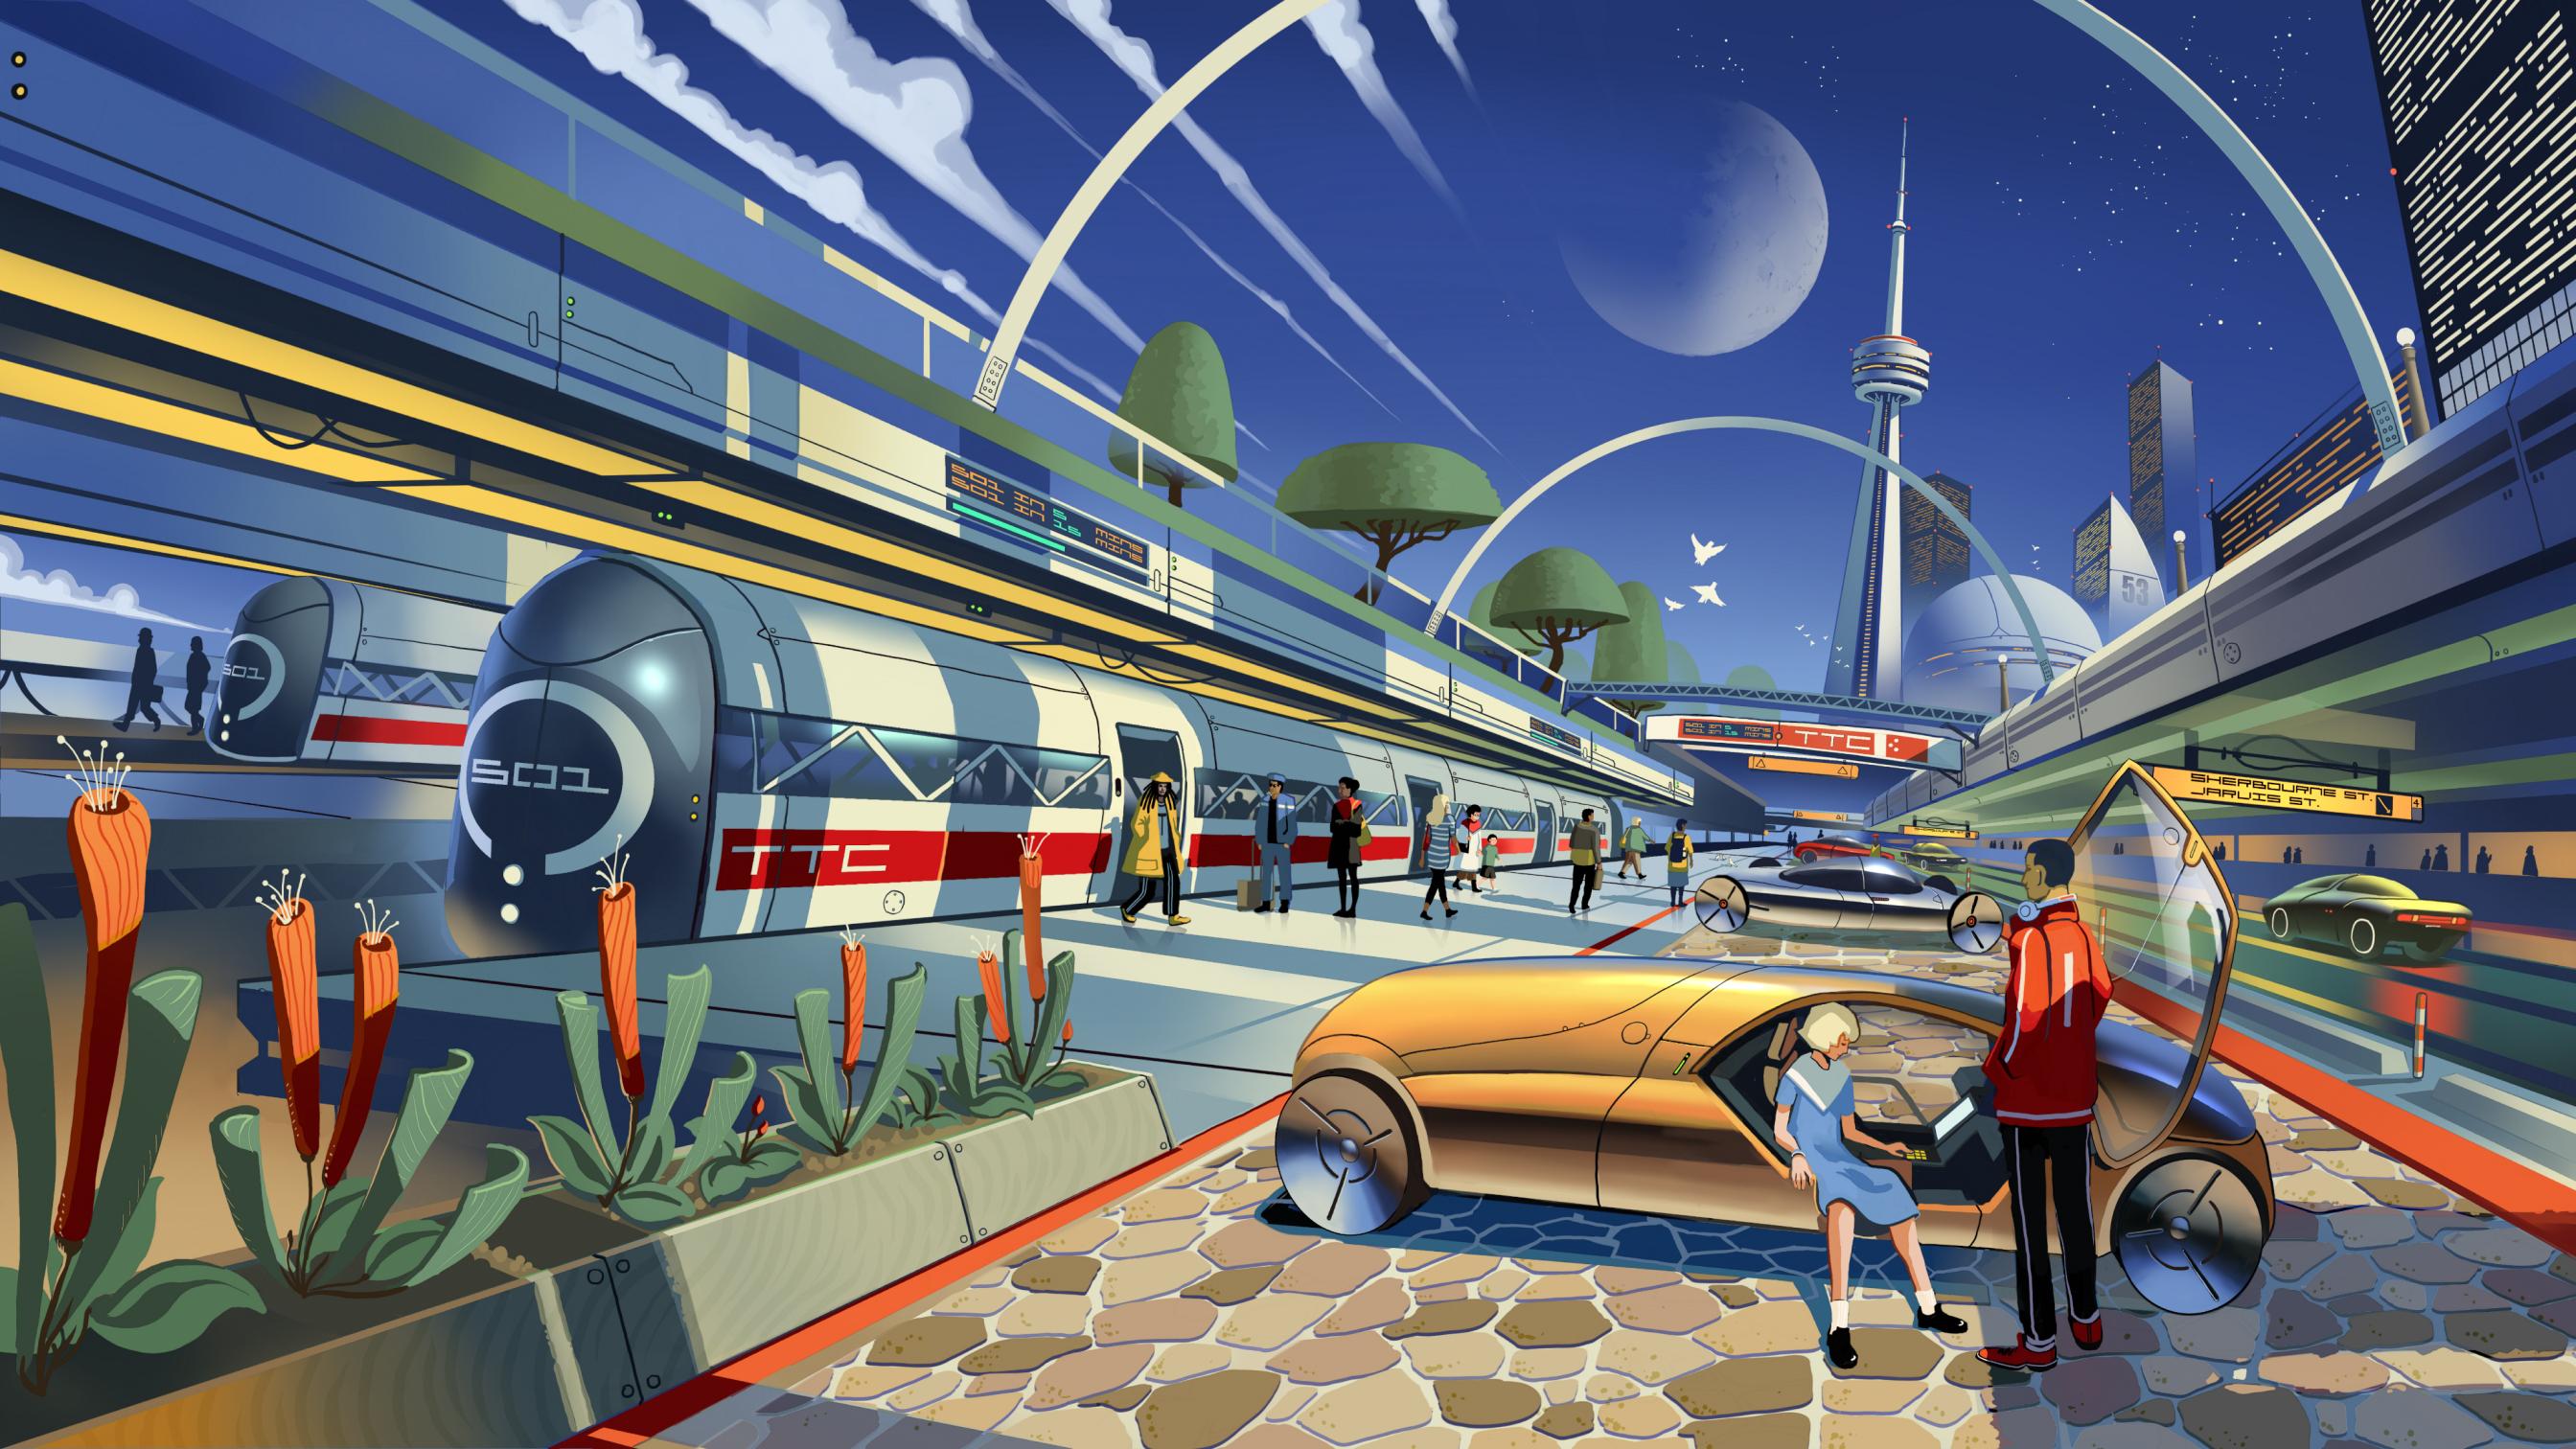 A futuristic illustration